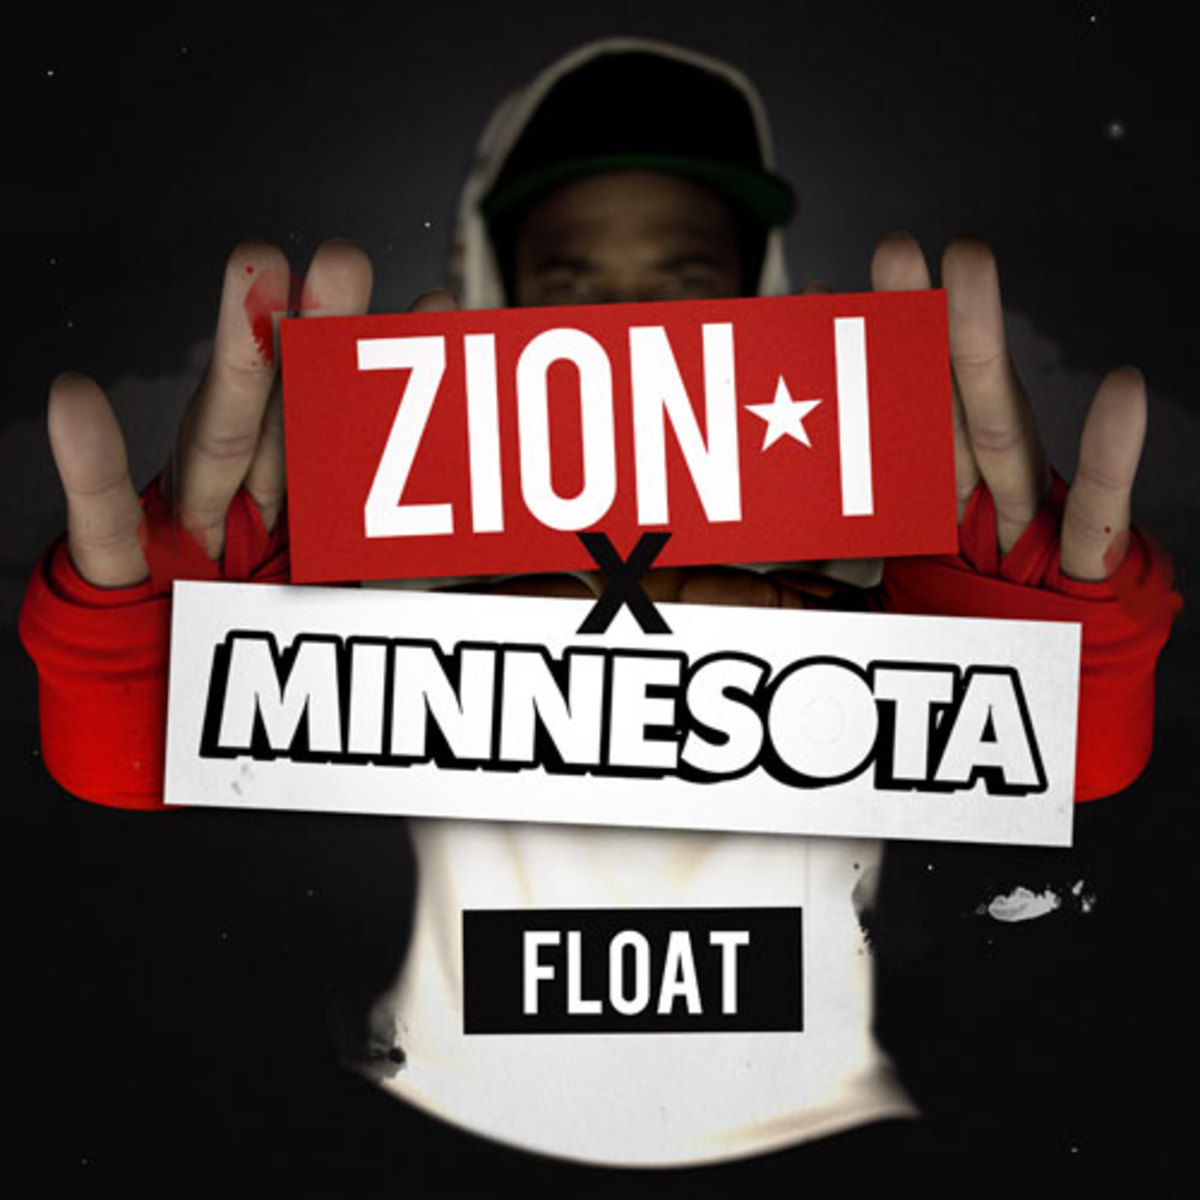 zioni-float.jpg